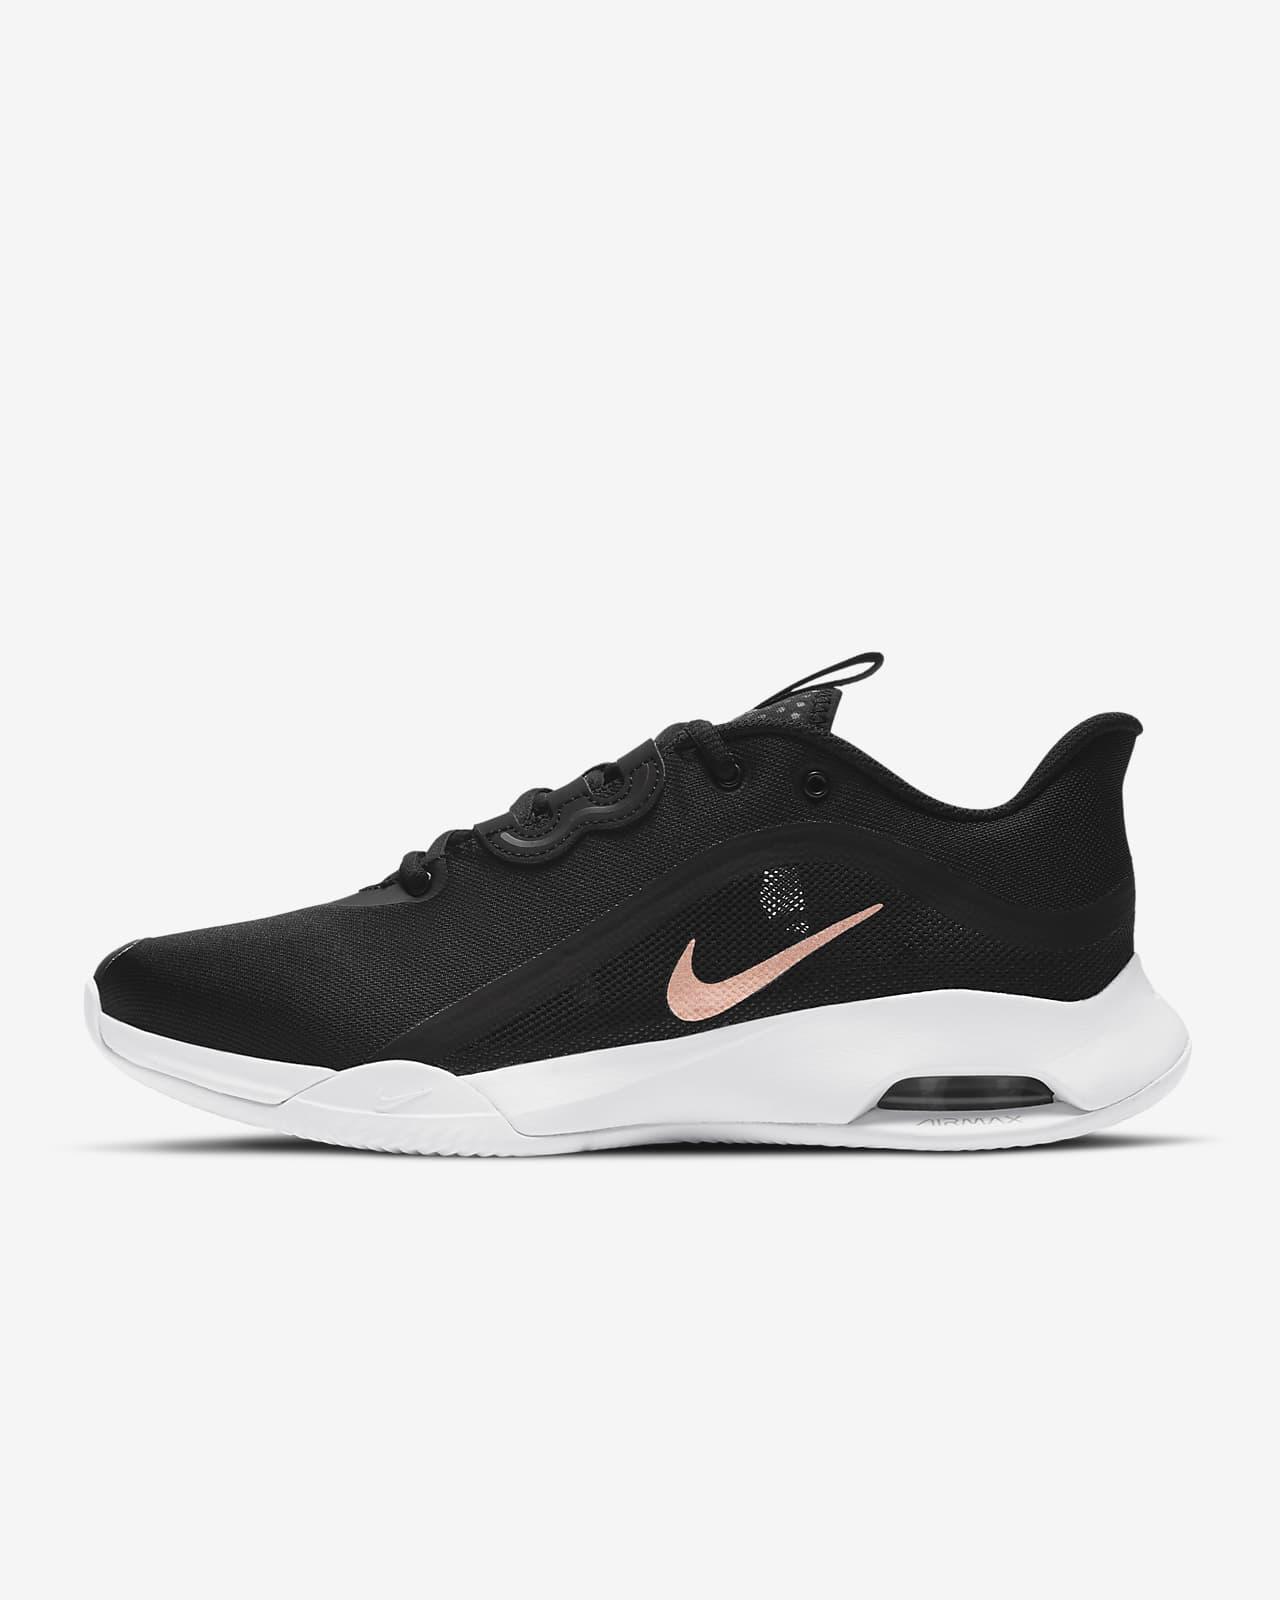 NikeCourt Air Max Volley Women's Clay Tennis Shoe